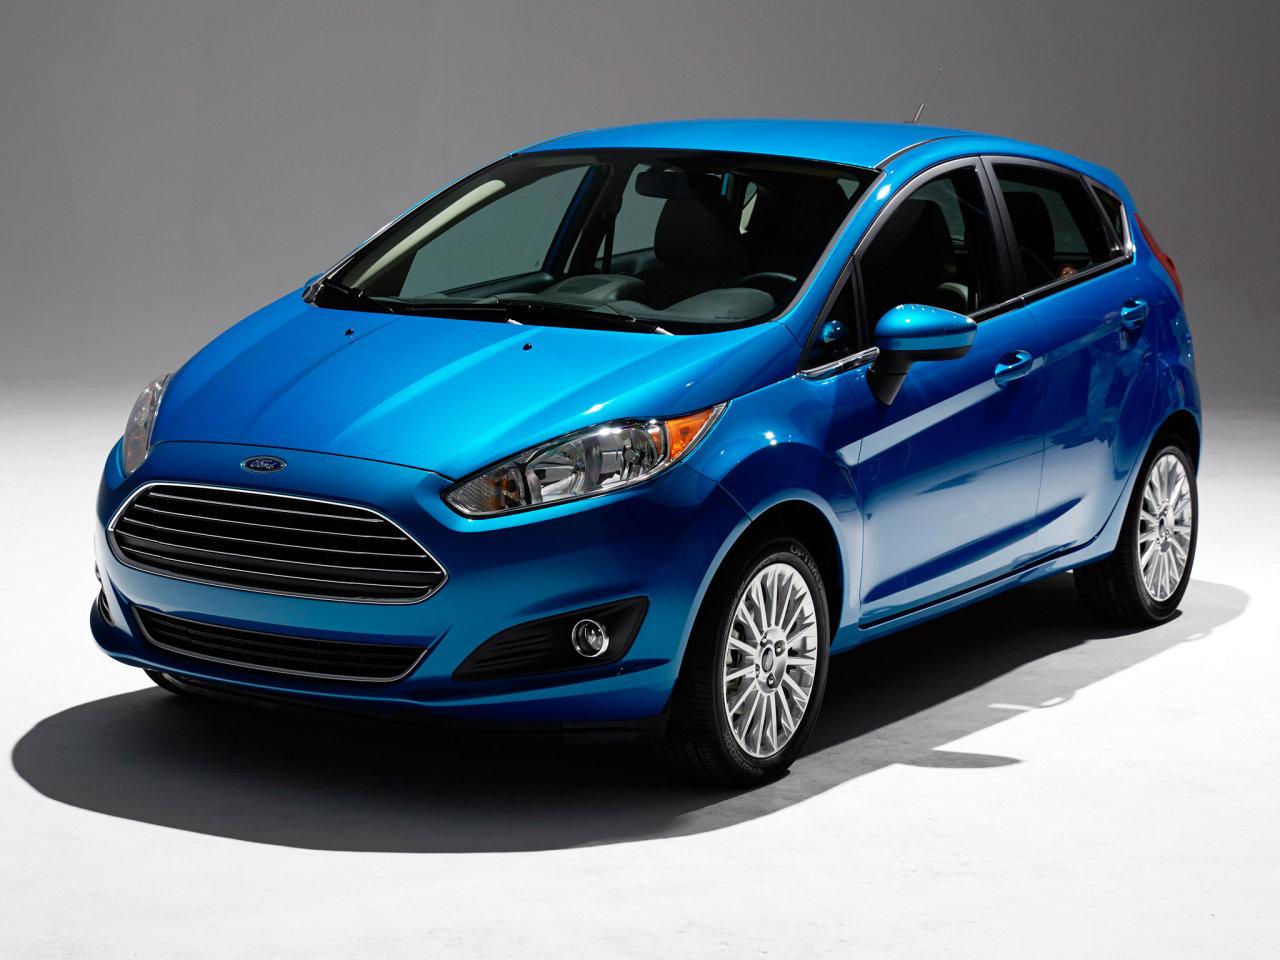 Ford Fiesta (2017-2018) - фото, цена, характеристики Форд ...